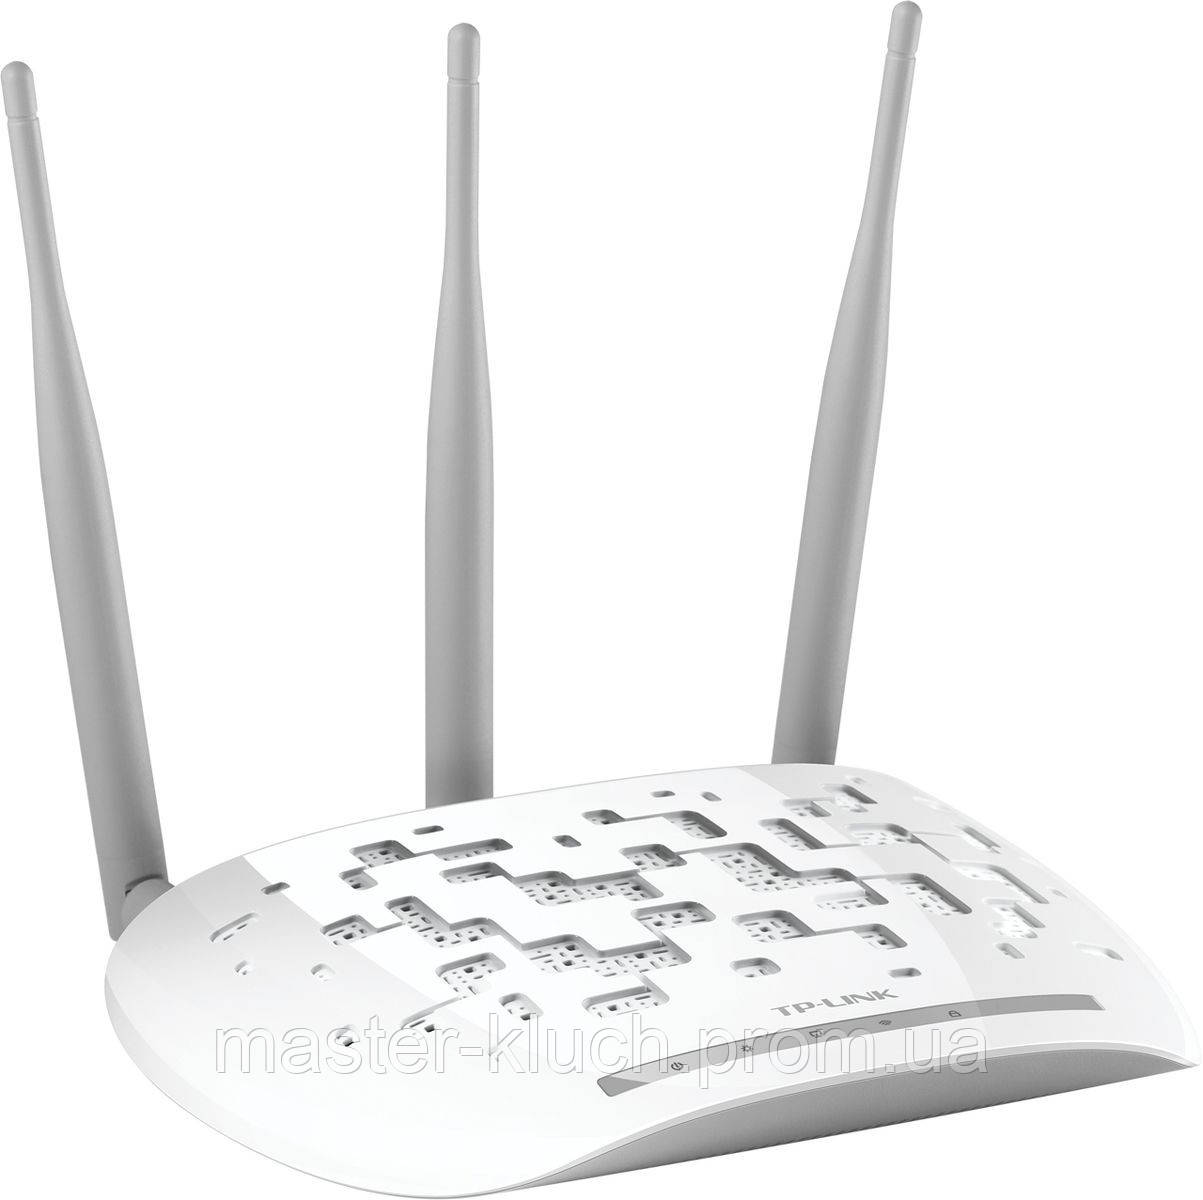 Точка доступа TP-LINK TL-WA901ND Wi-Fi 802.11g/n 300Mb, PoE, 3 антенны